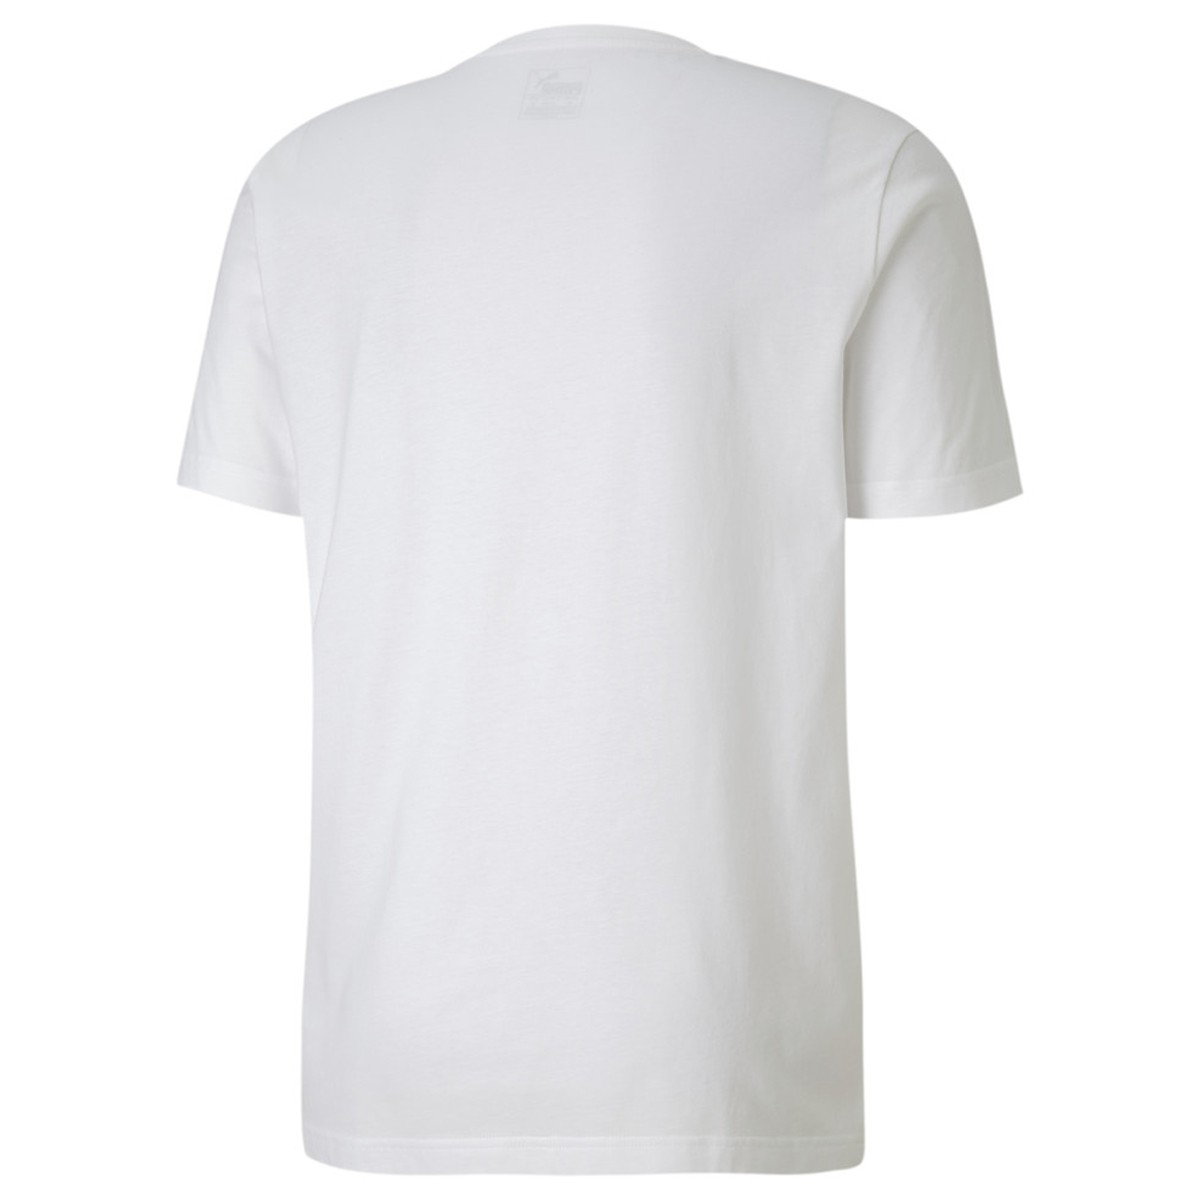 Camiseta Puma Masculina Flock Graphic Tee Branca